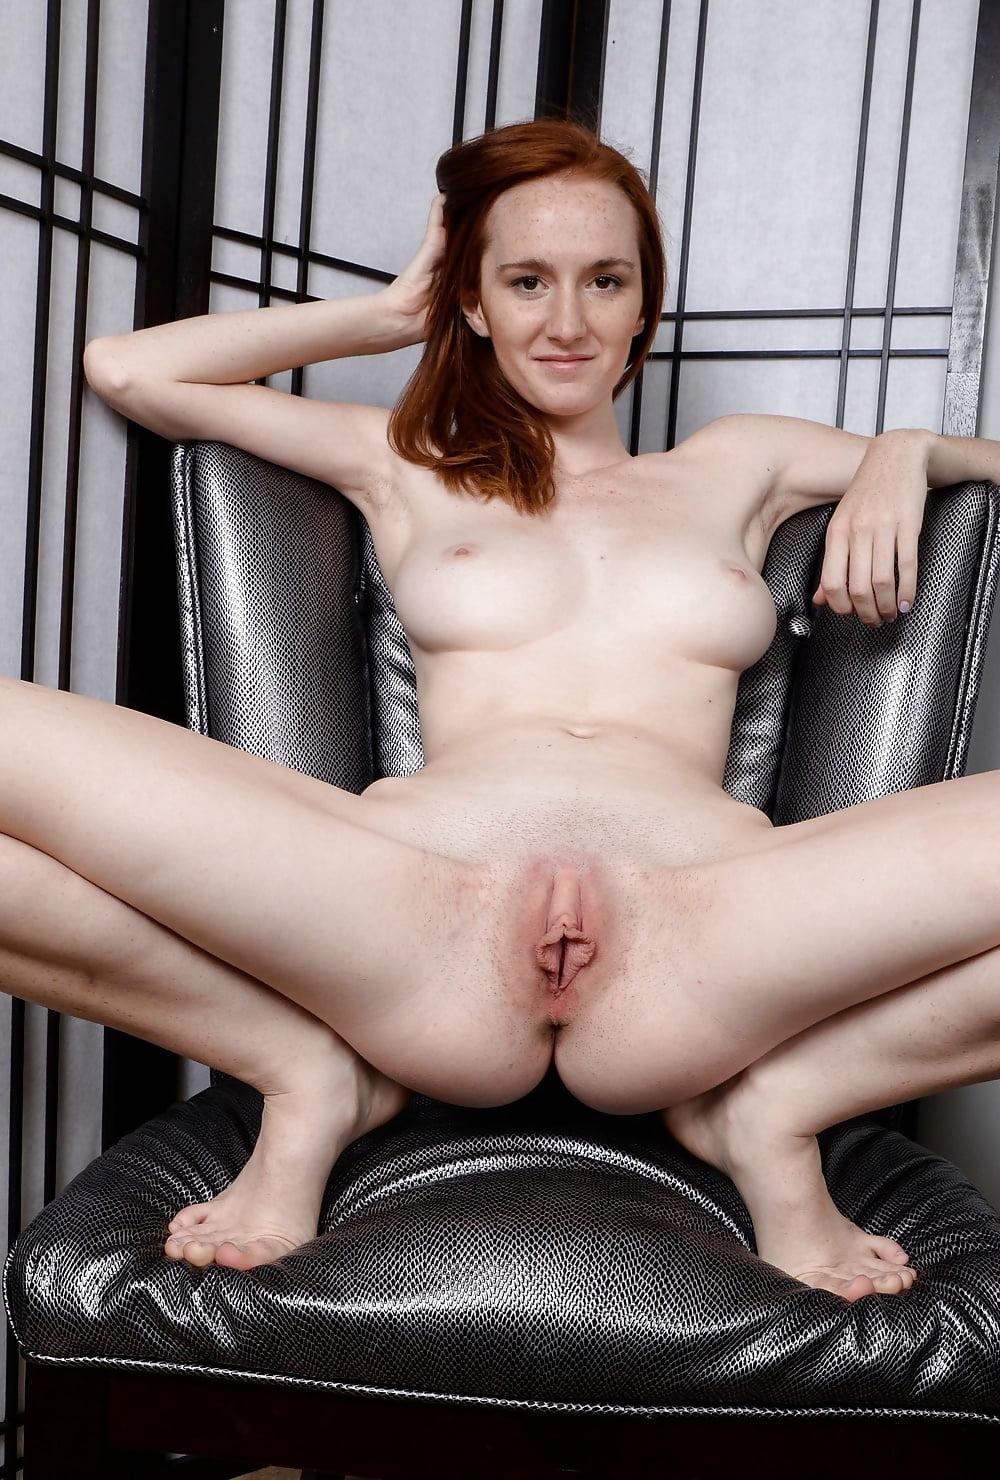 rani-porn-pics-deedee